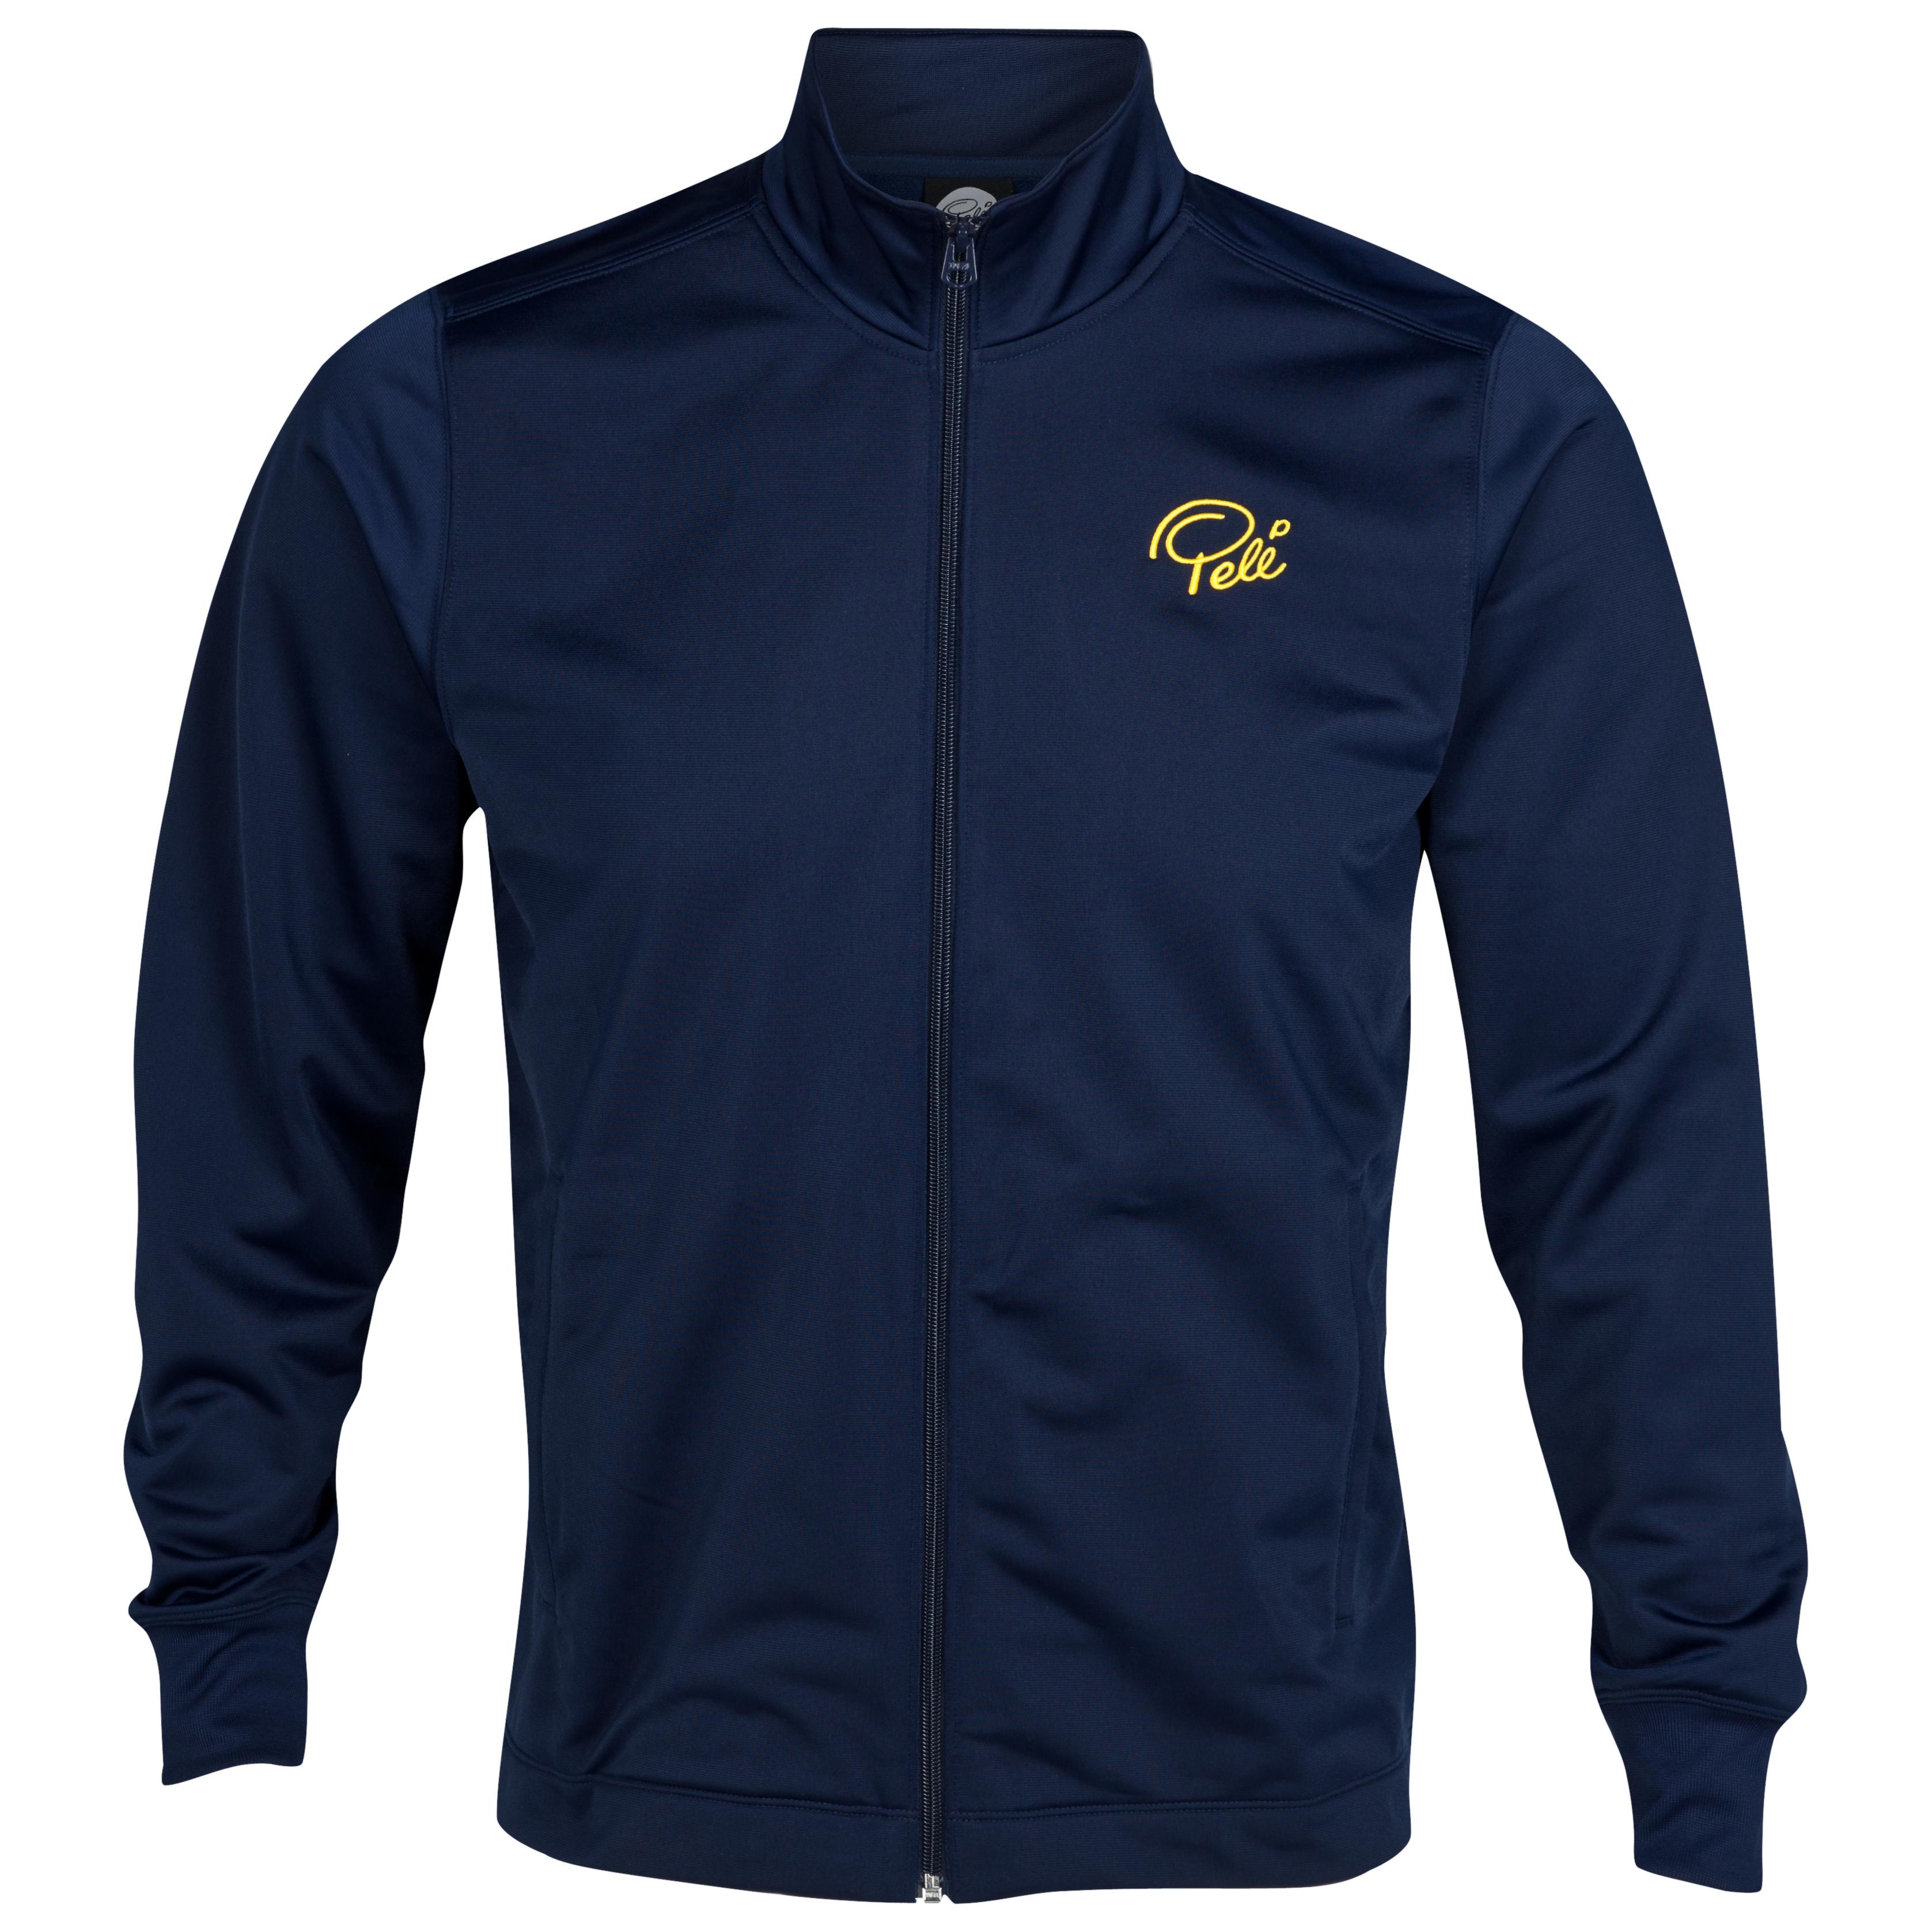 Pele Sports Core Track Jacket - Peacoat Navy